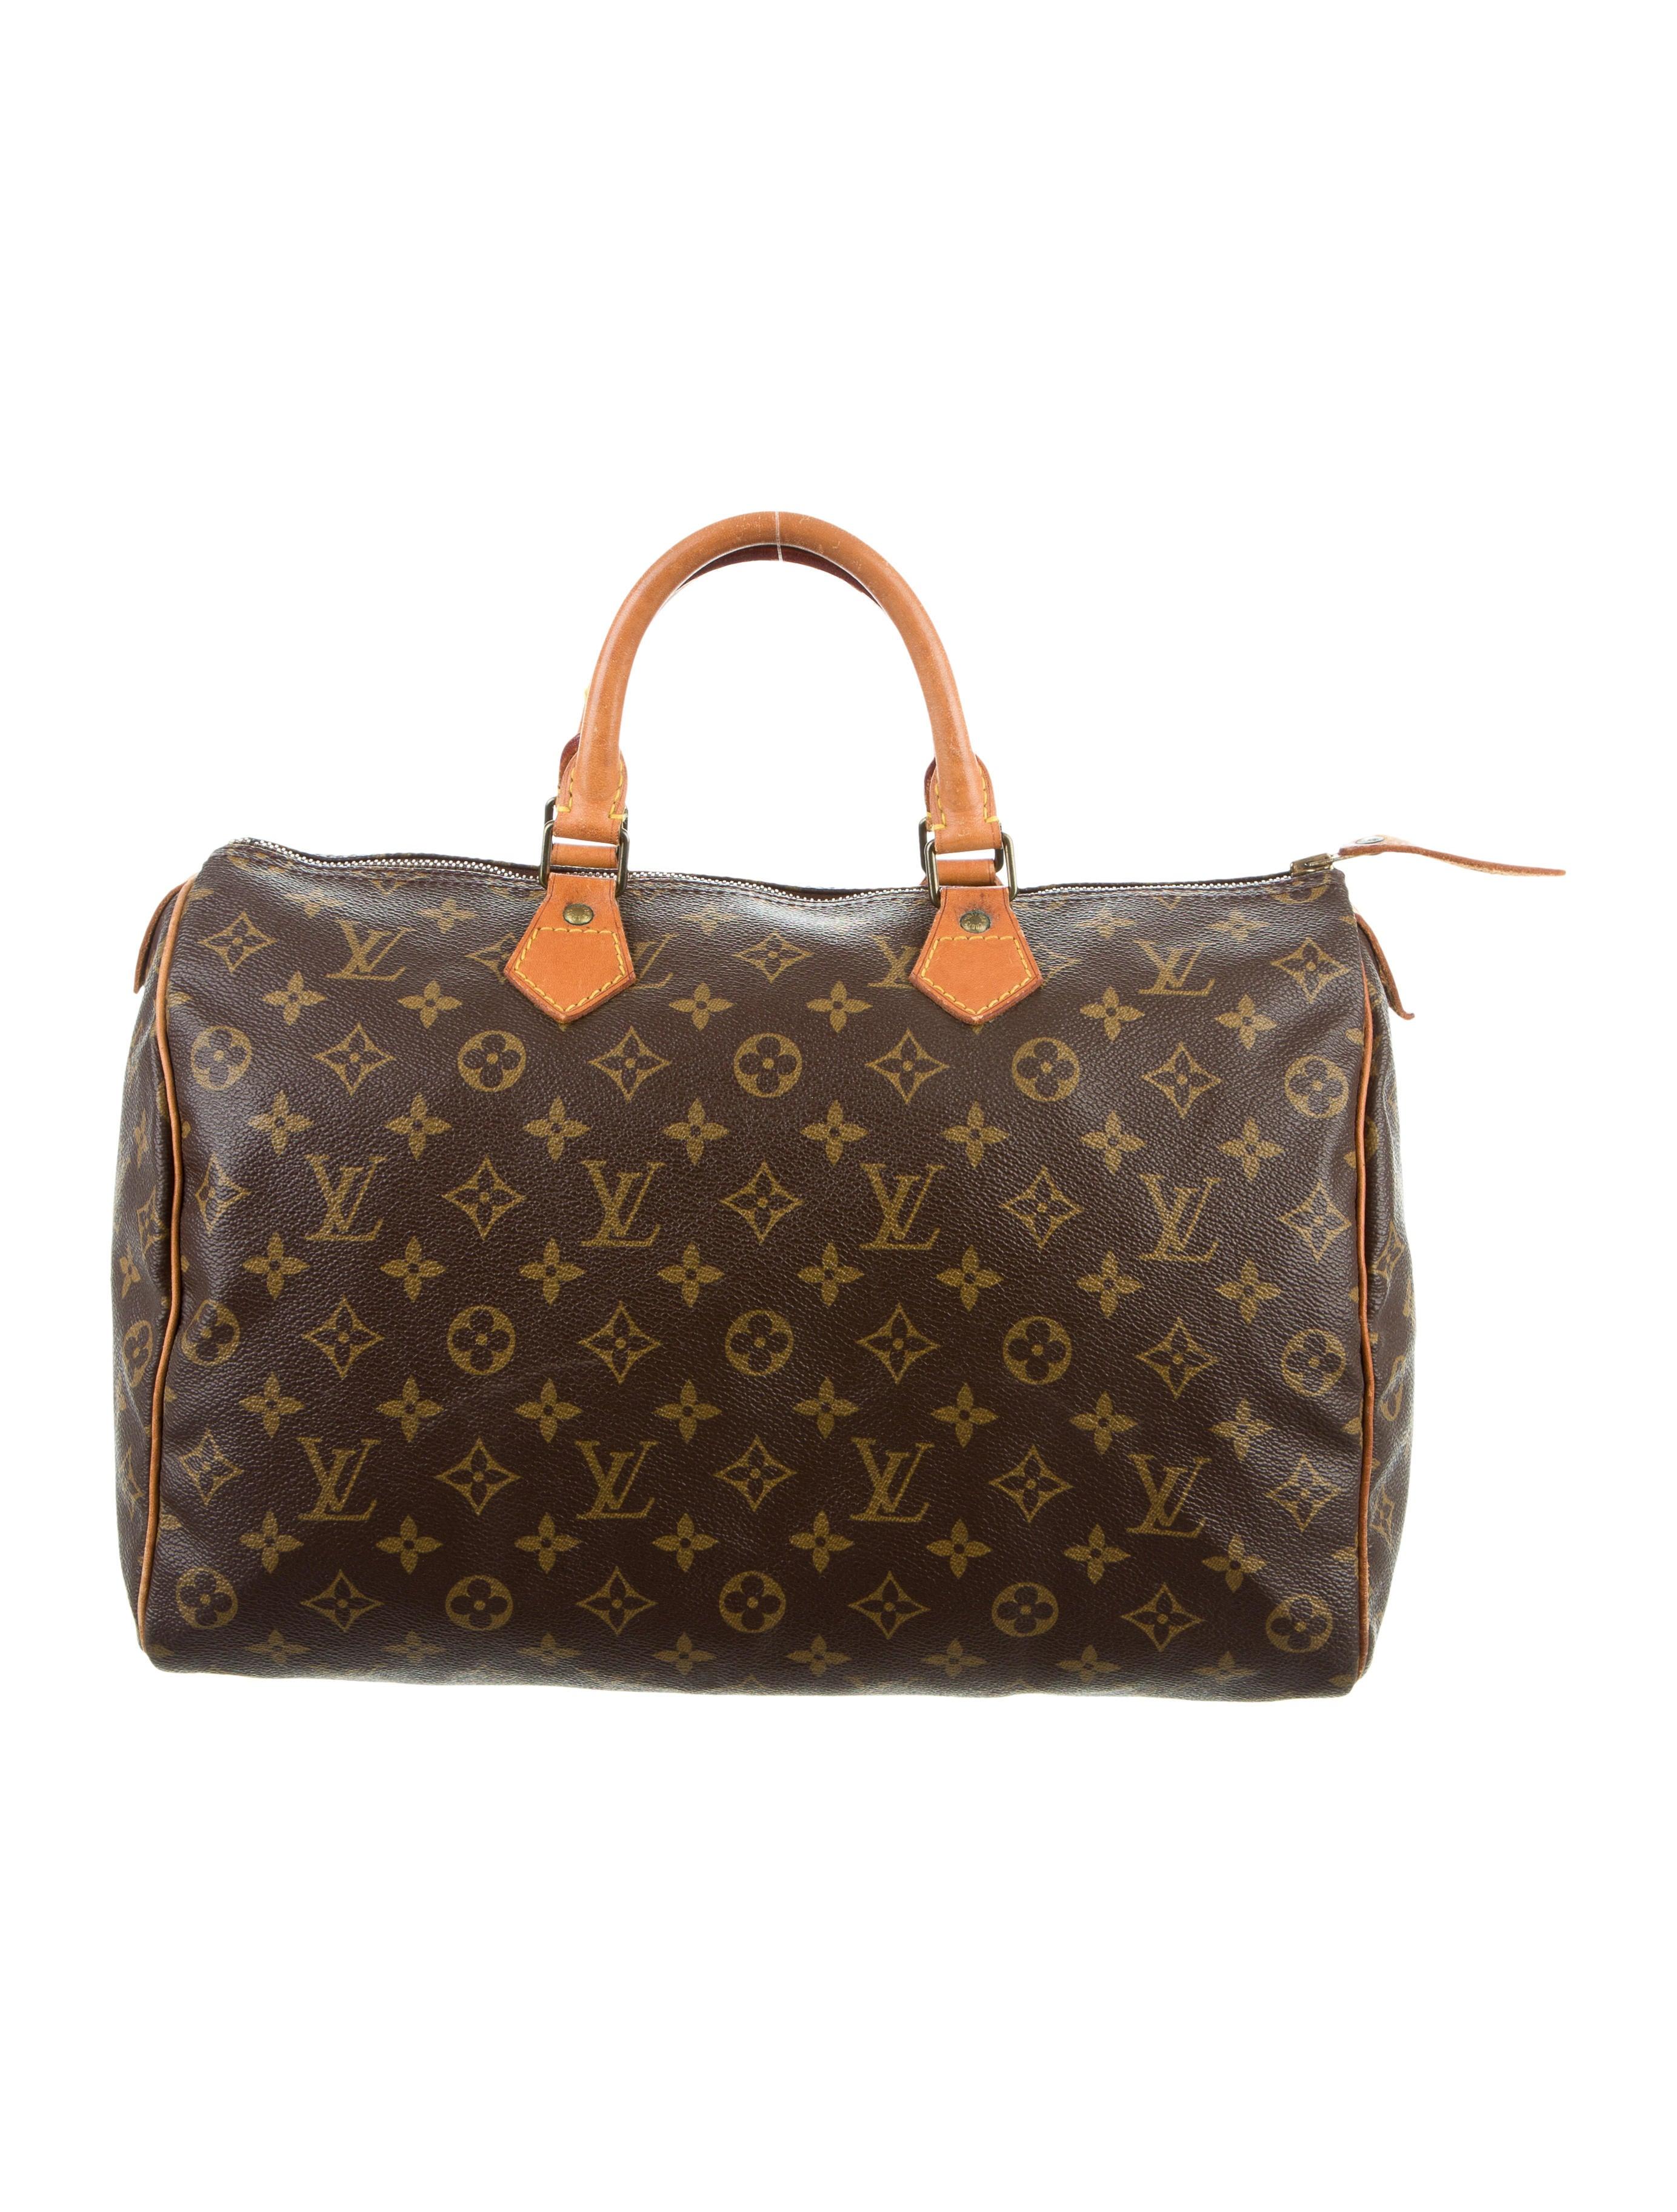 Louis vuitton monogram speedy 35 handbags lou120879 for Louis vuitton miroir speedy 35